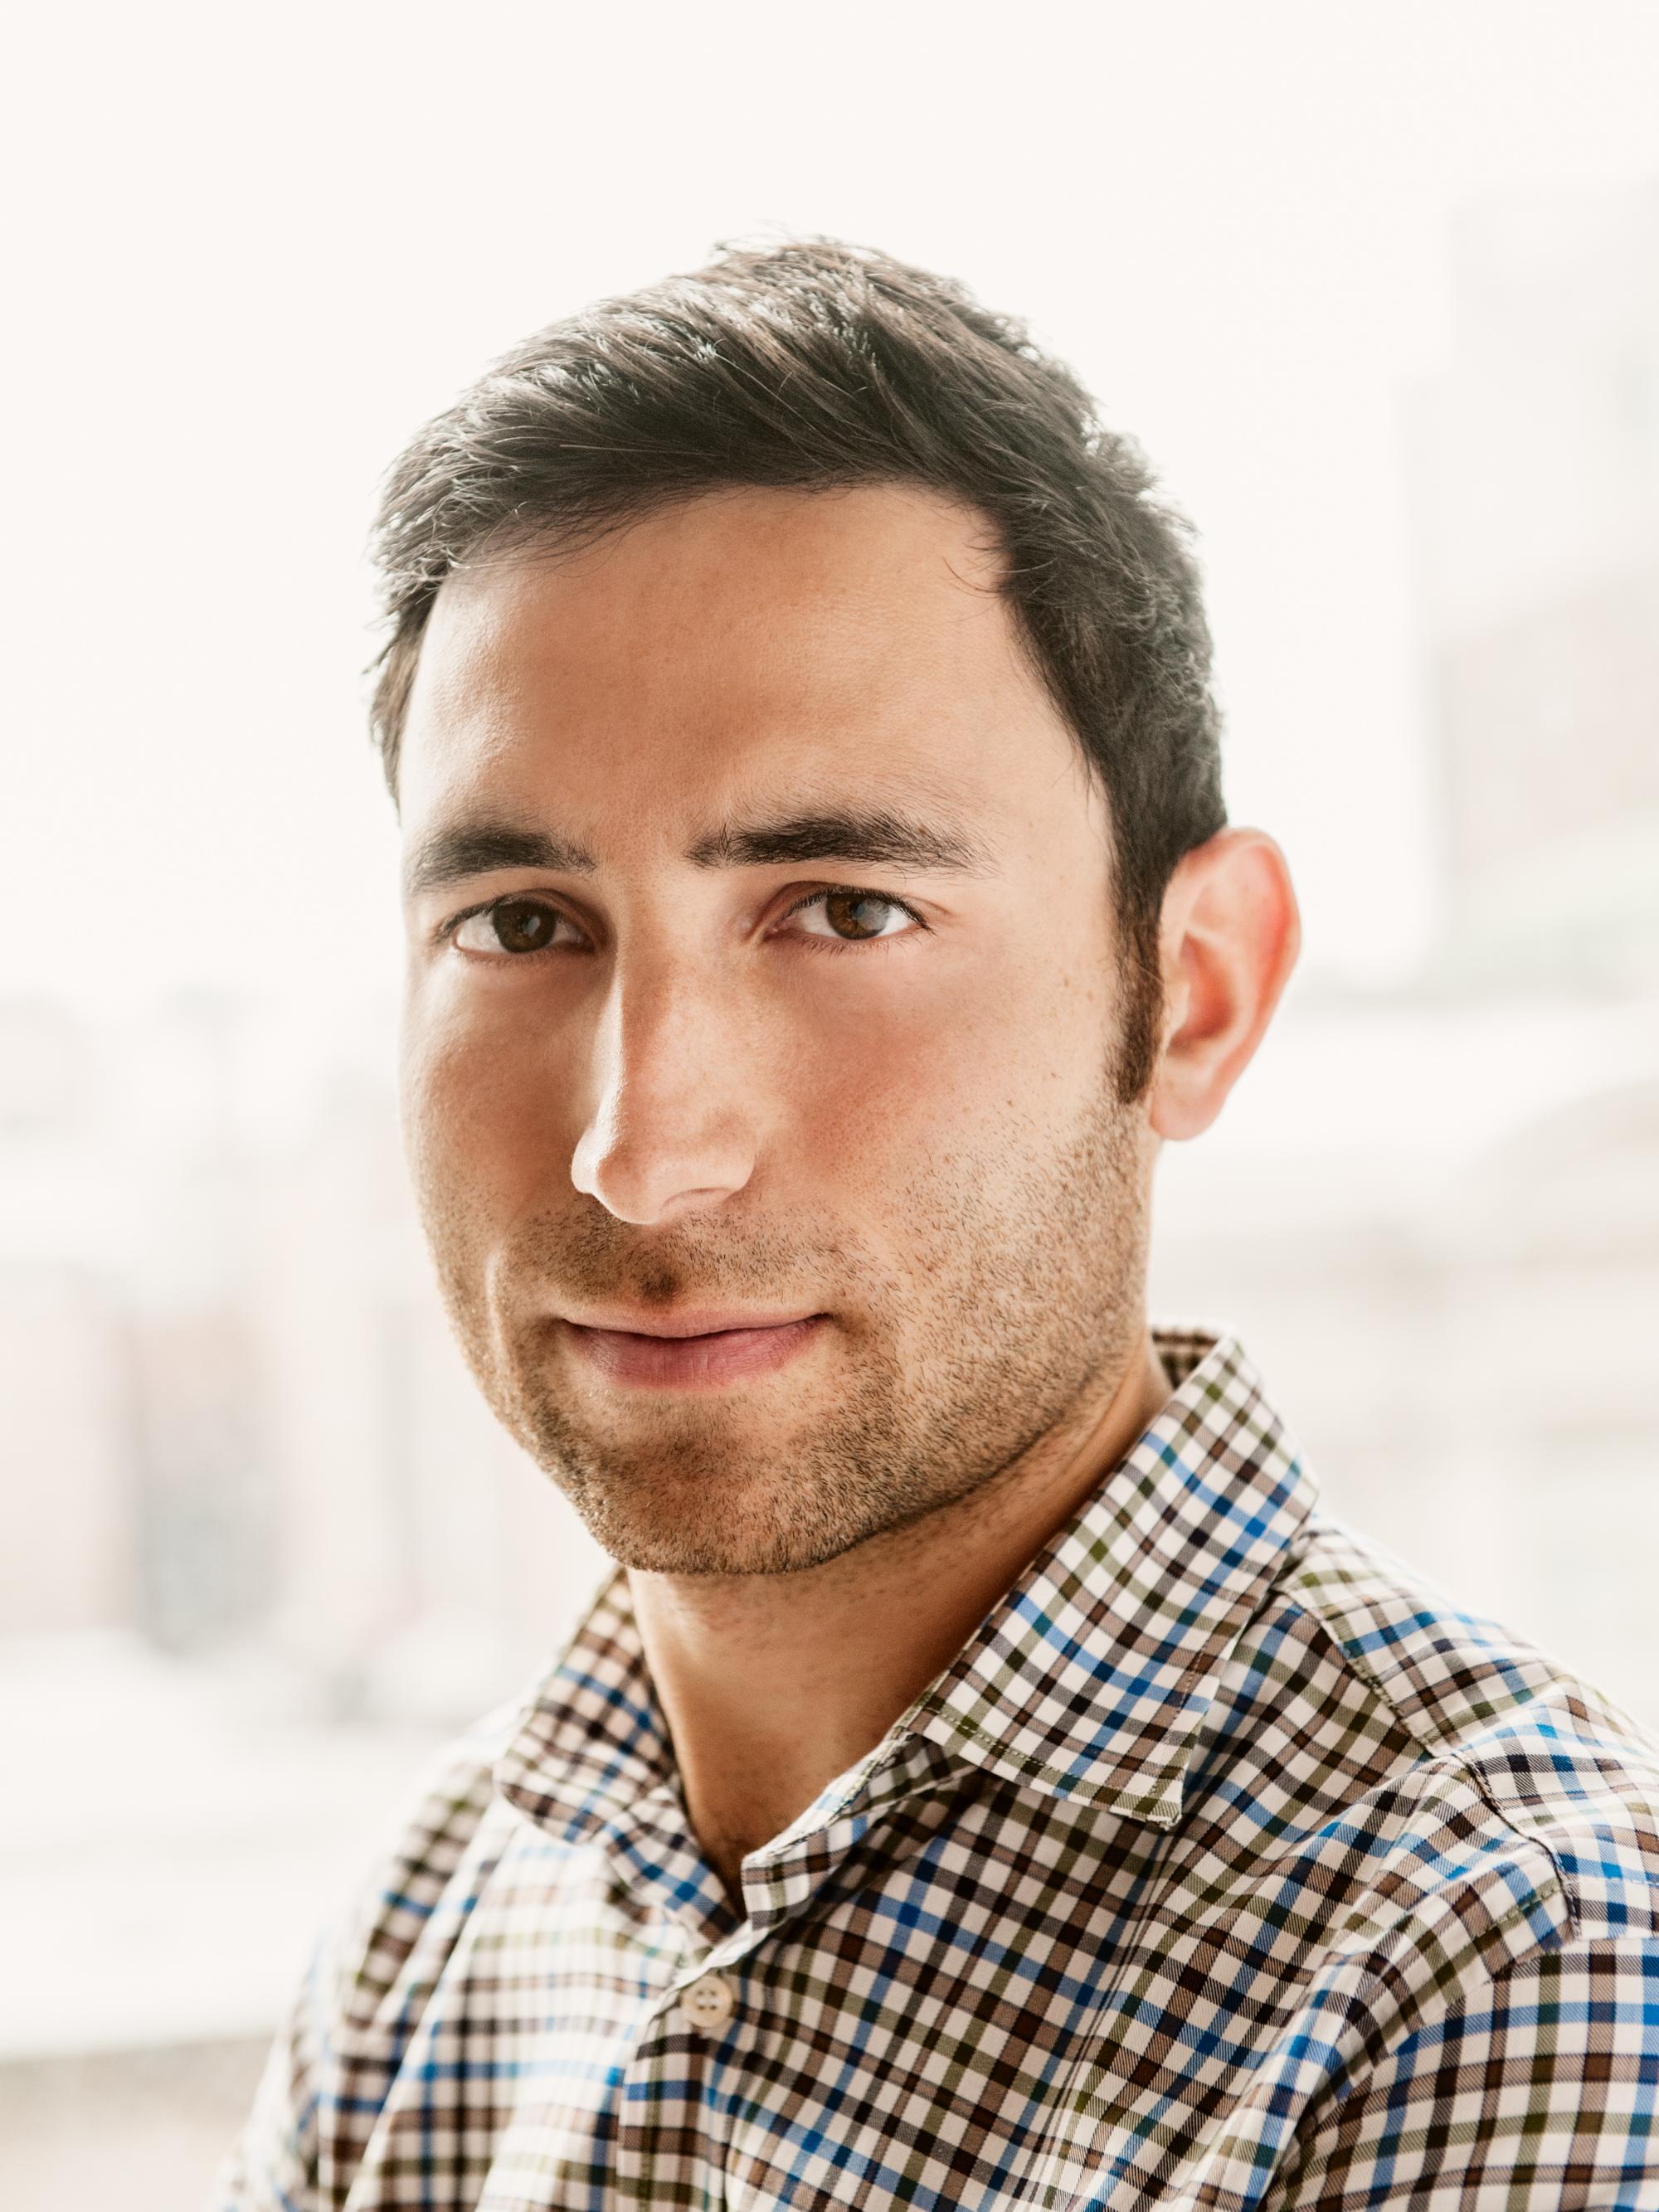 Scott Belsky, Co-founder of Behance